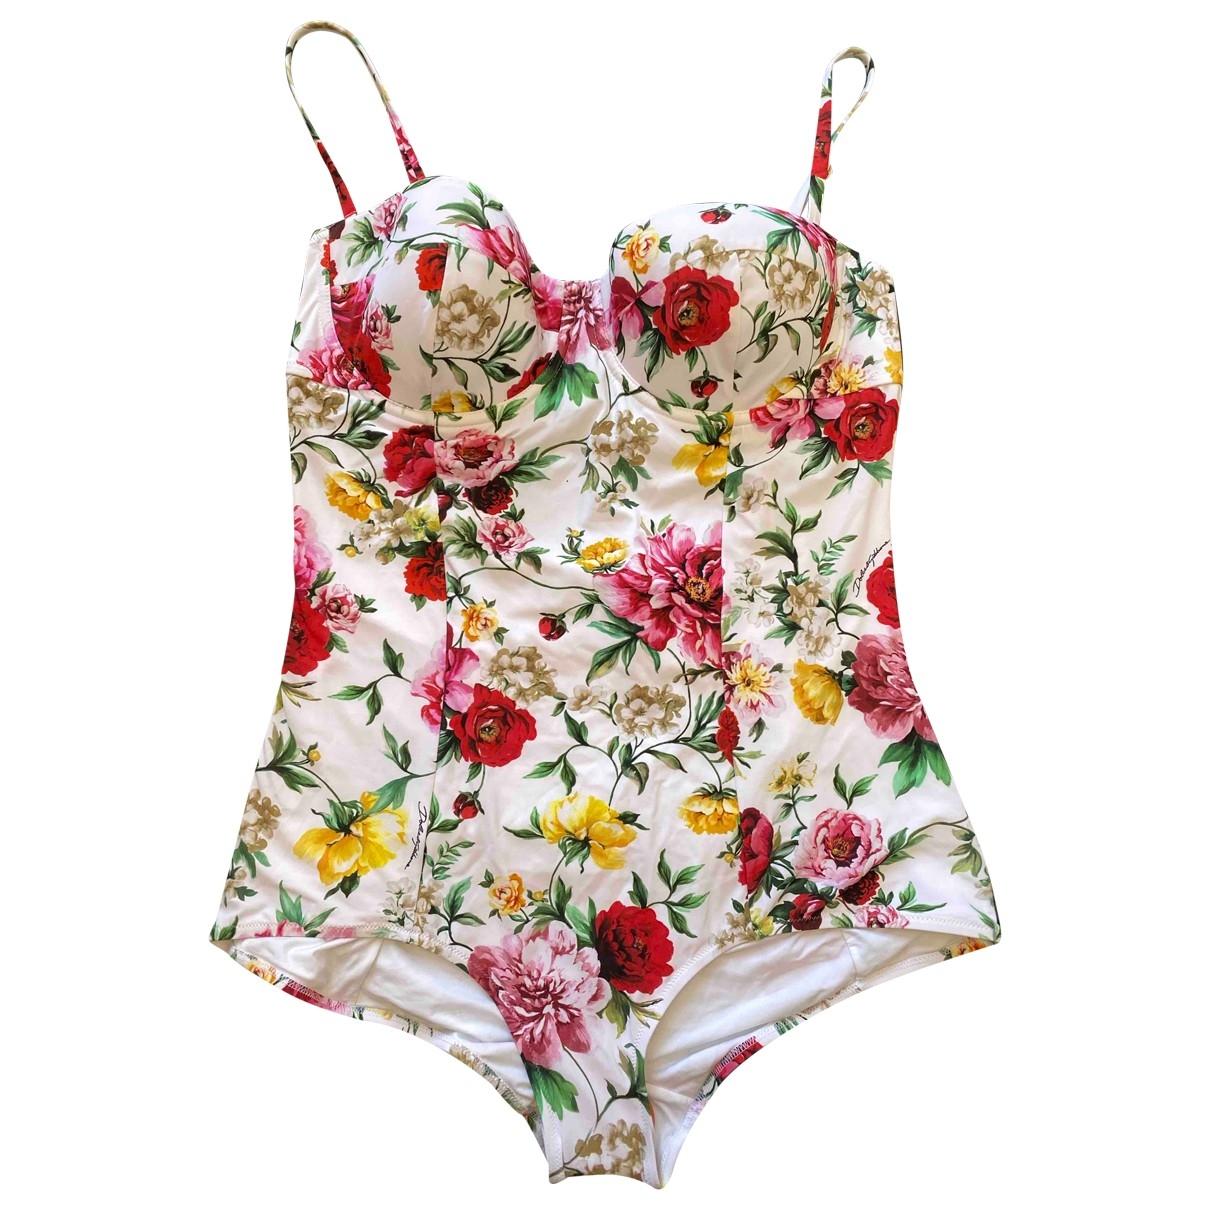 Dolce & Gabbana \N Badeanzug in  Bunt Polyester